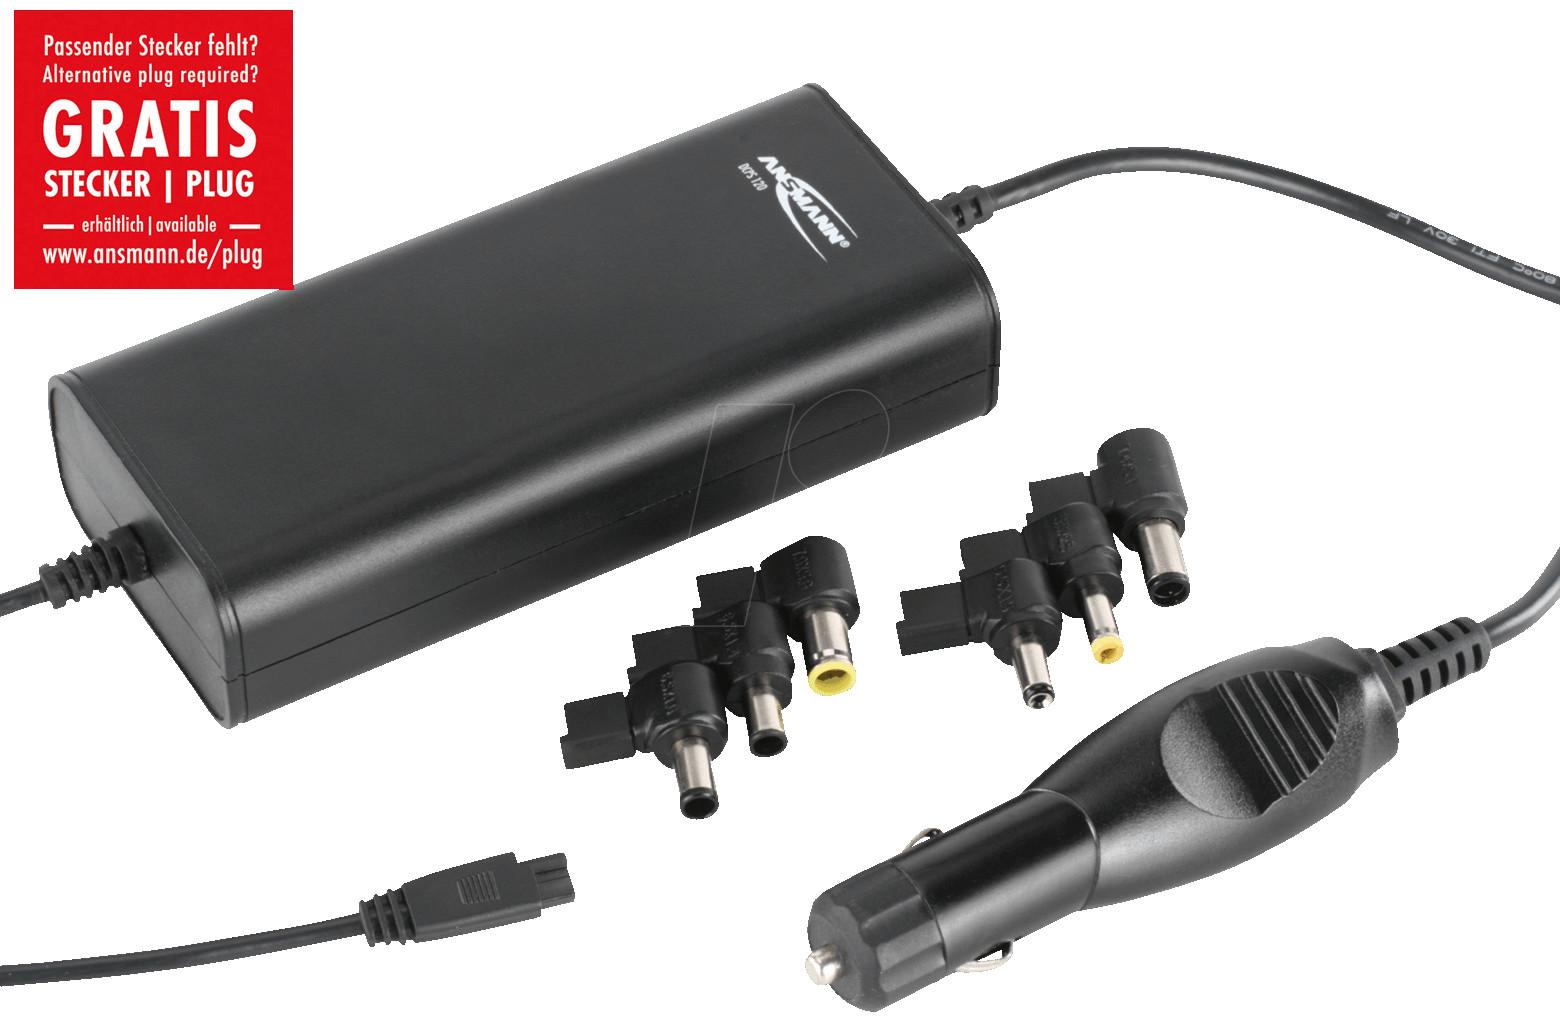 ansmann 12v laptop adapter reichelt DCPS_120_01